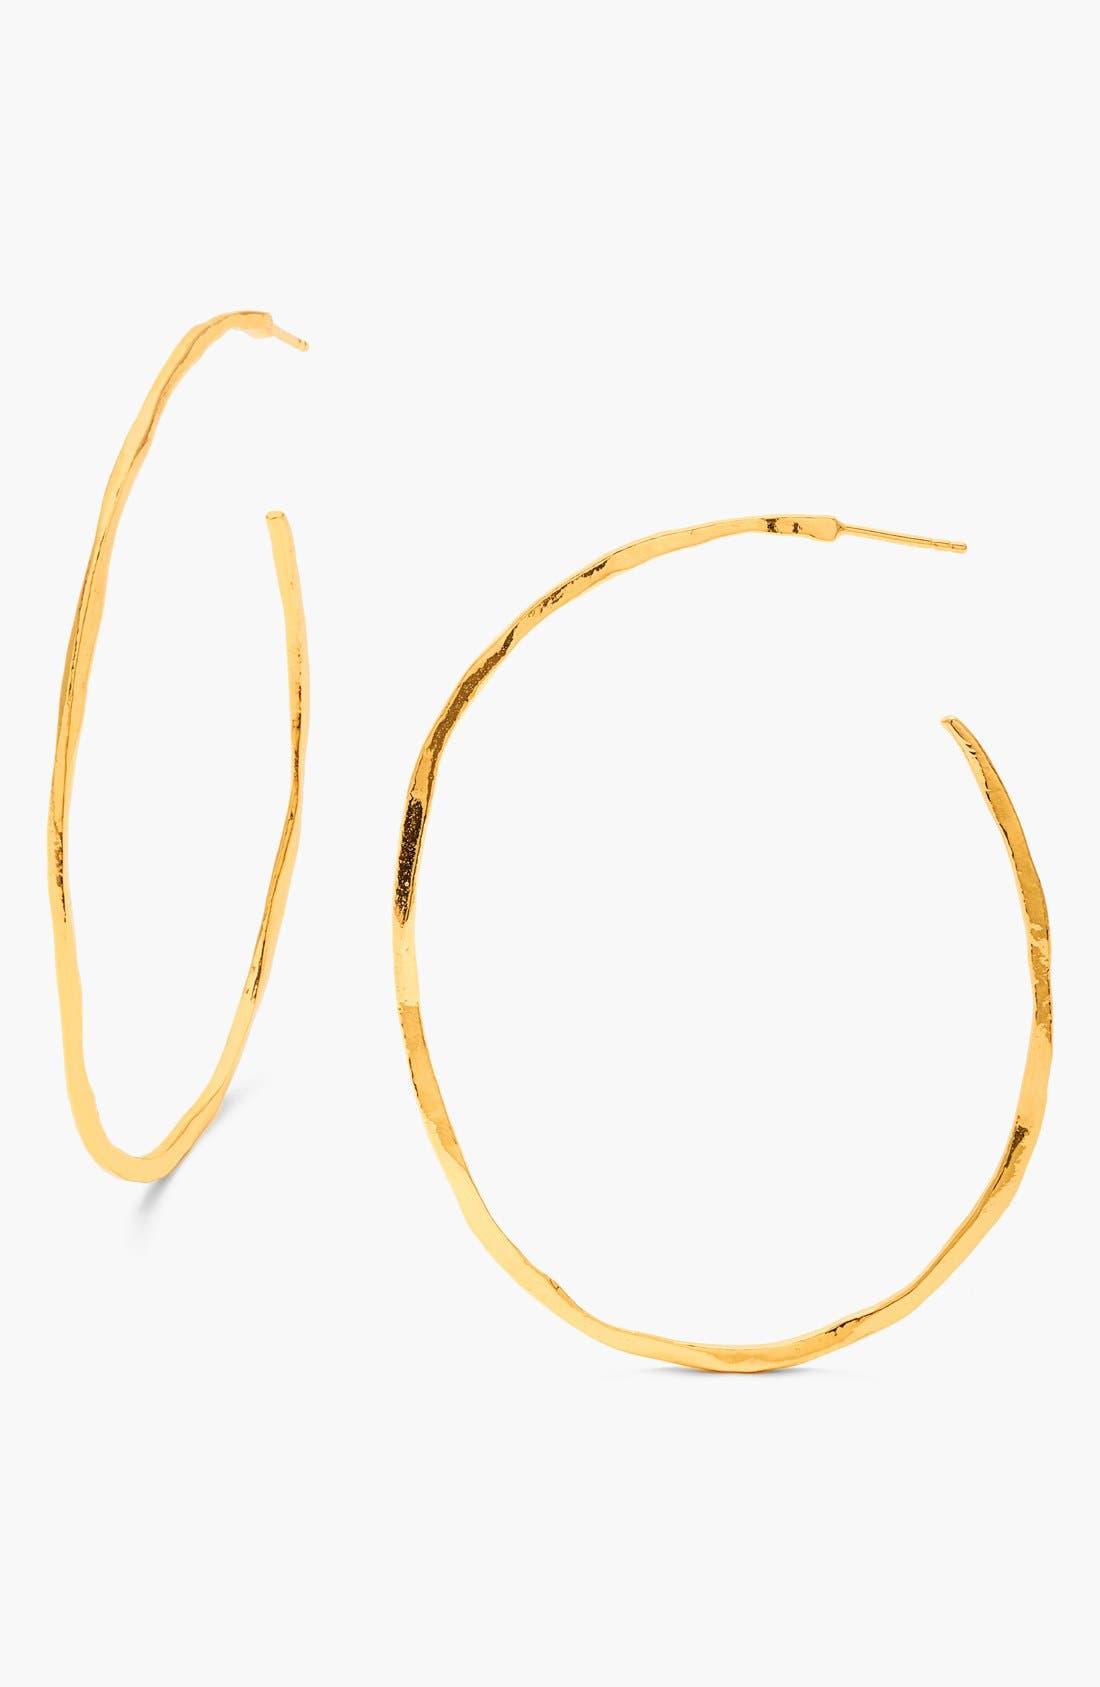 GORJANA, 'Laurel' Hoop Earrings, Main thumbnail 1, color, 710